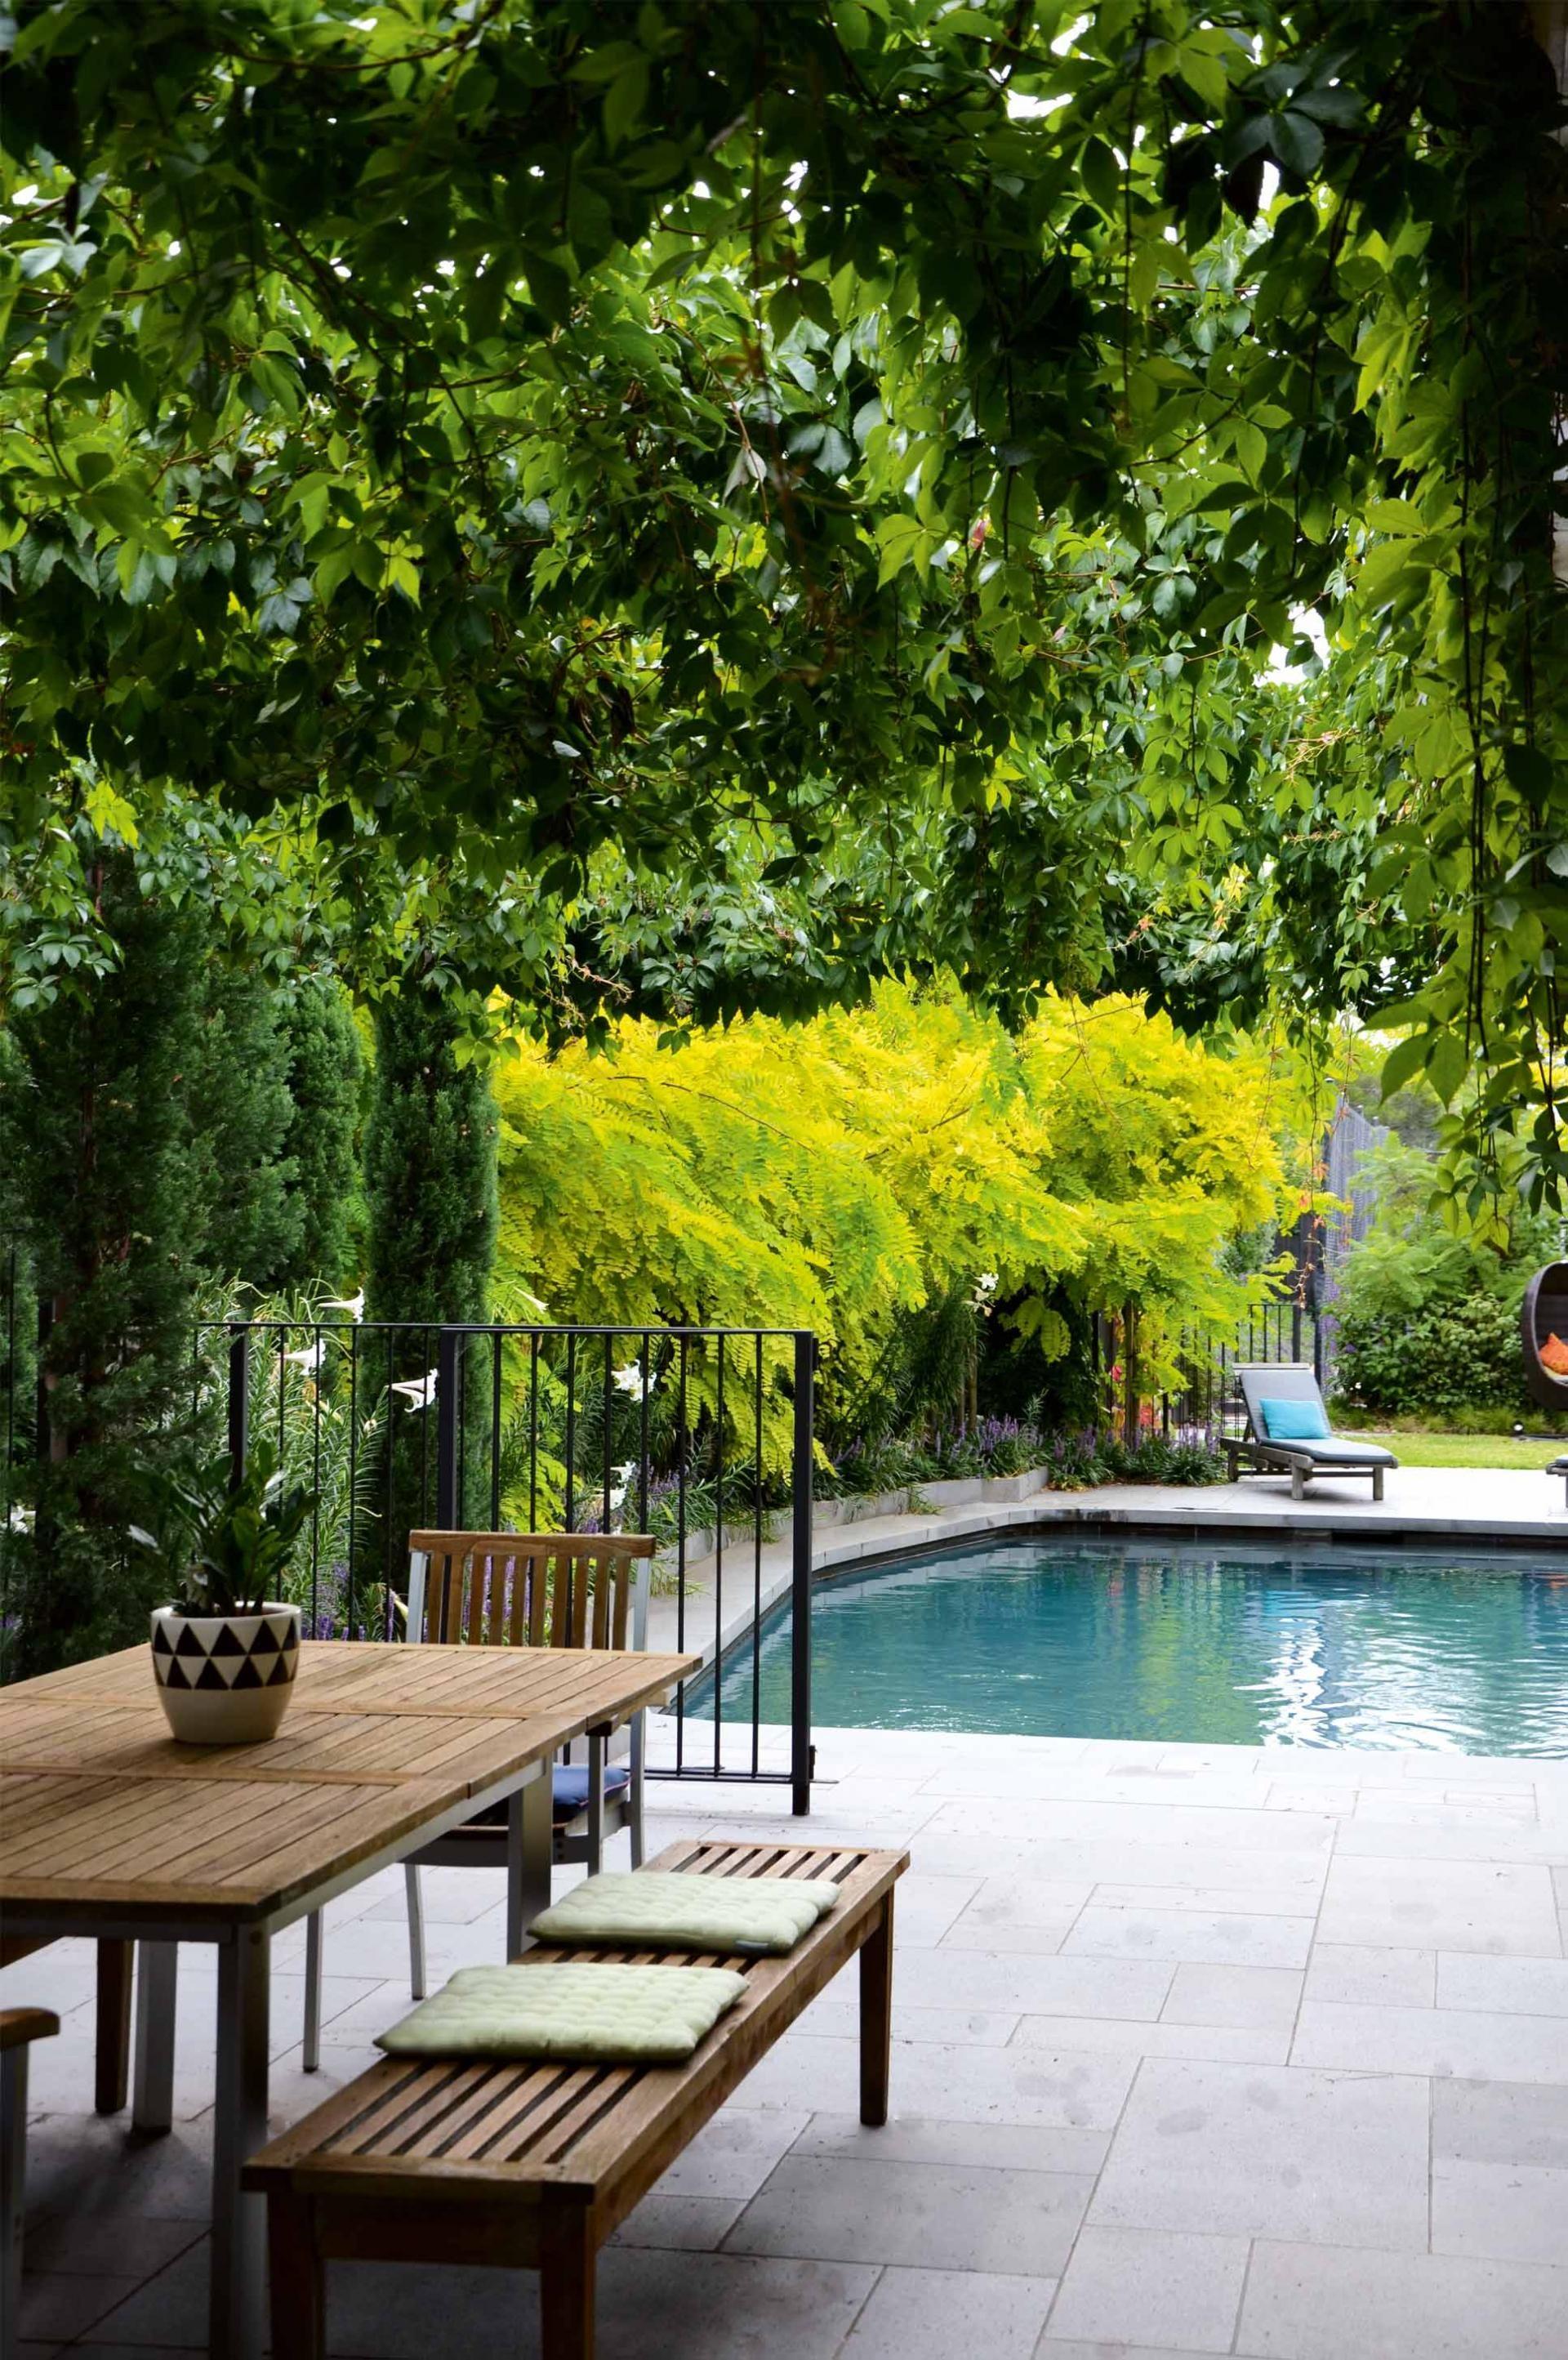 15 Of The Best Backyard Pools Small Backyard Landscaping Backyard Landscaping Designs Pool Landscaping